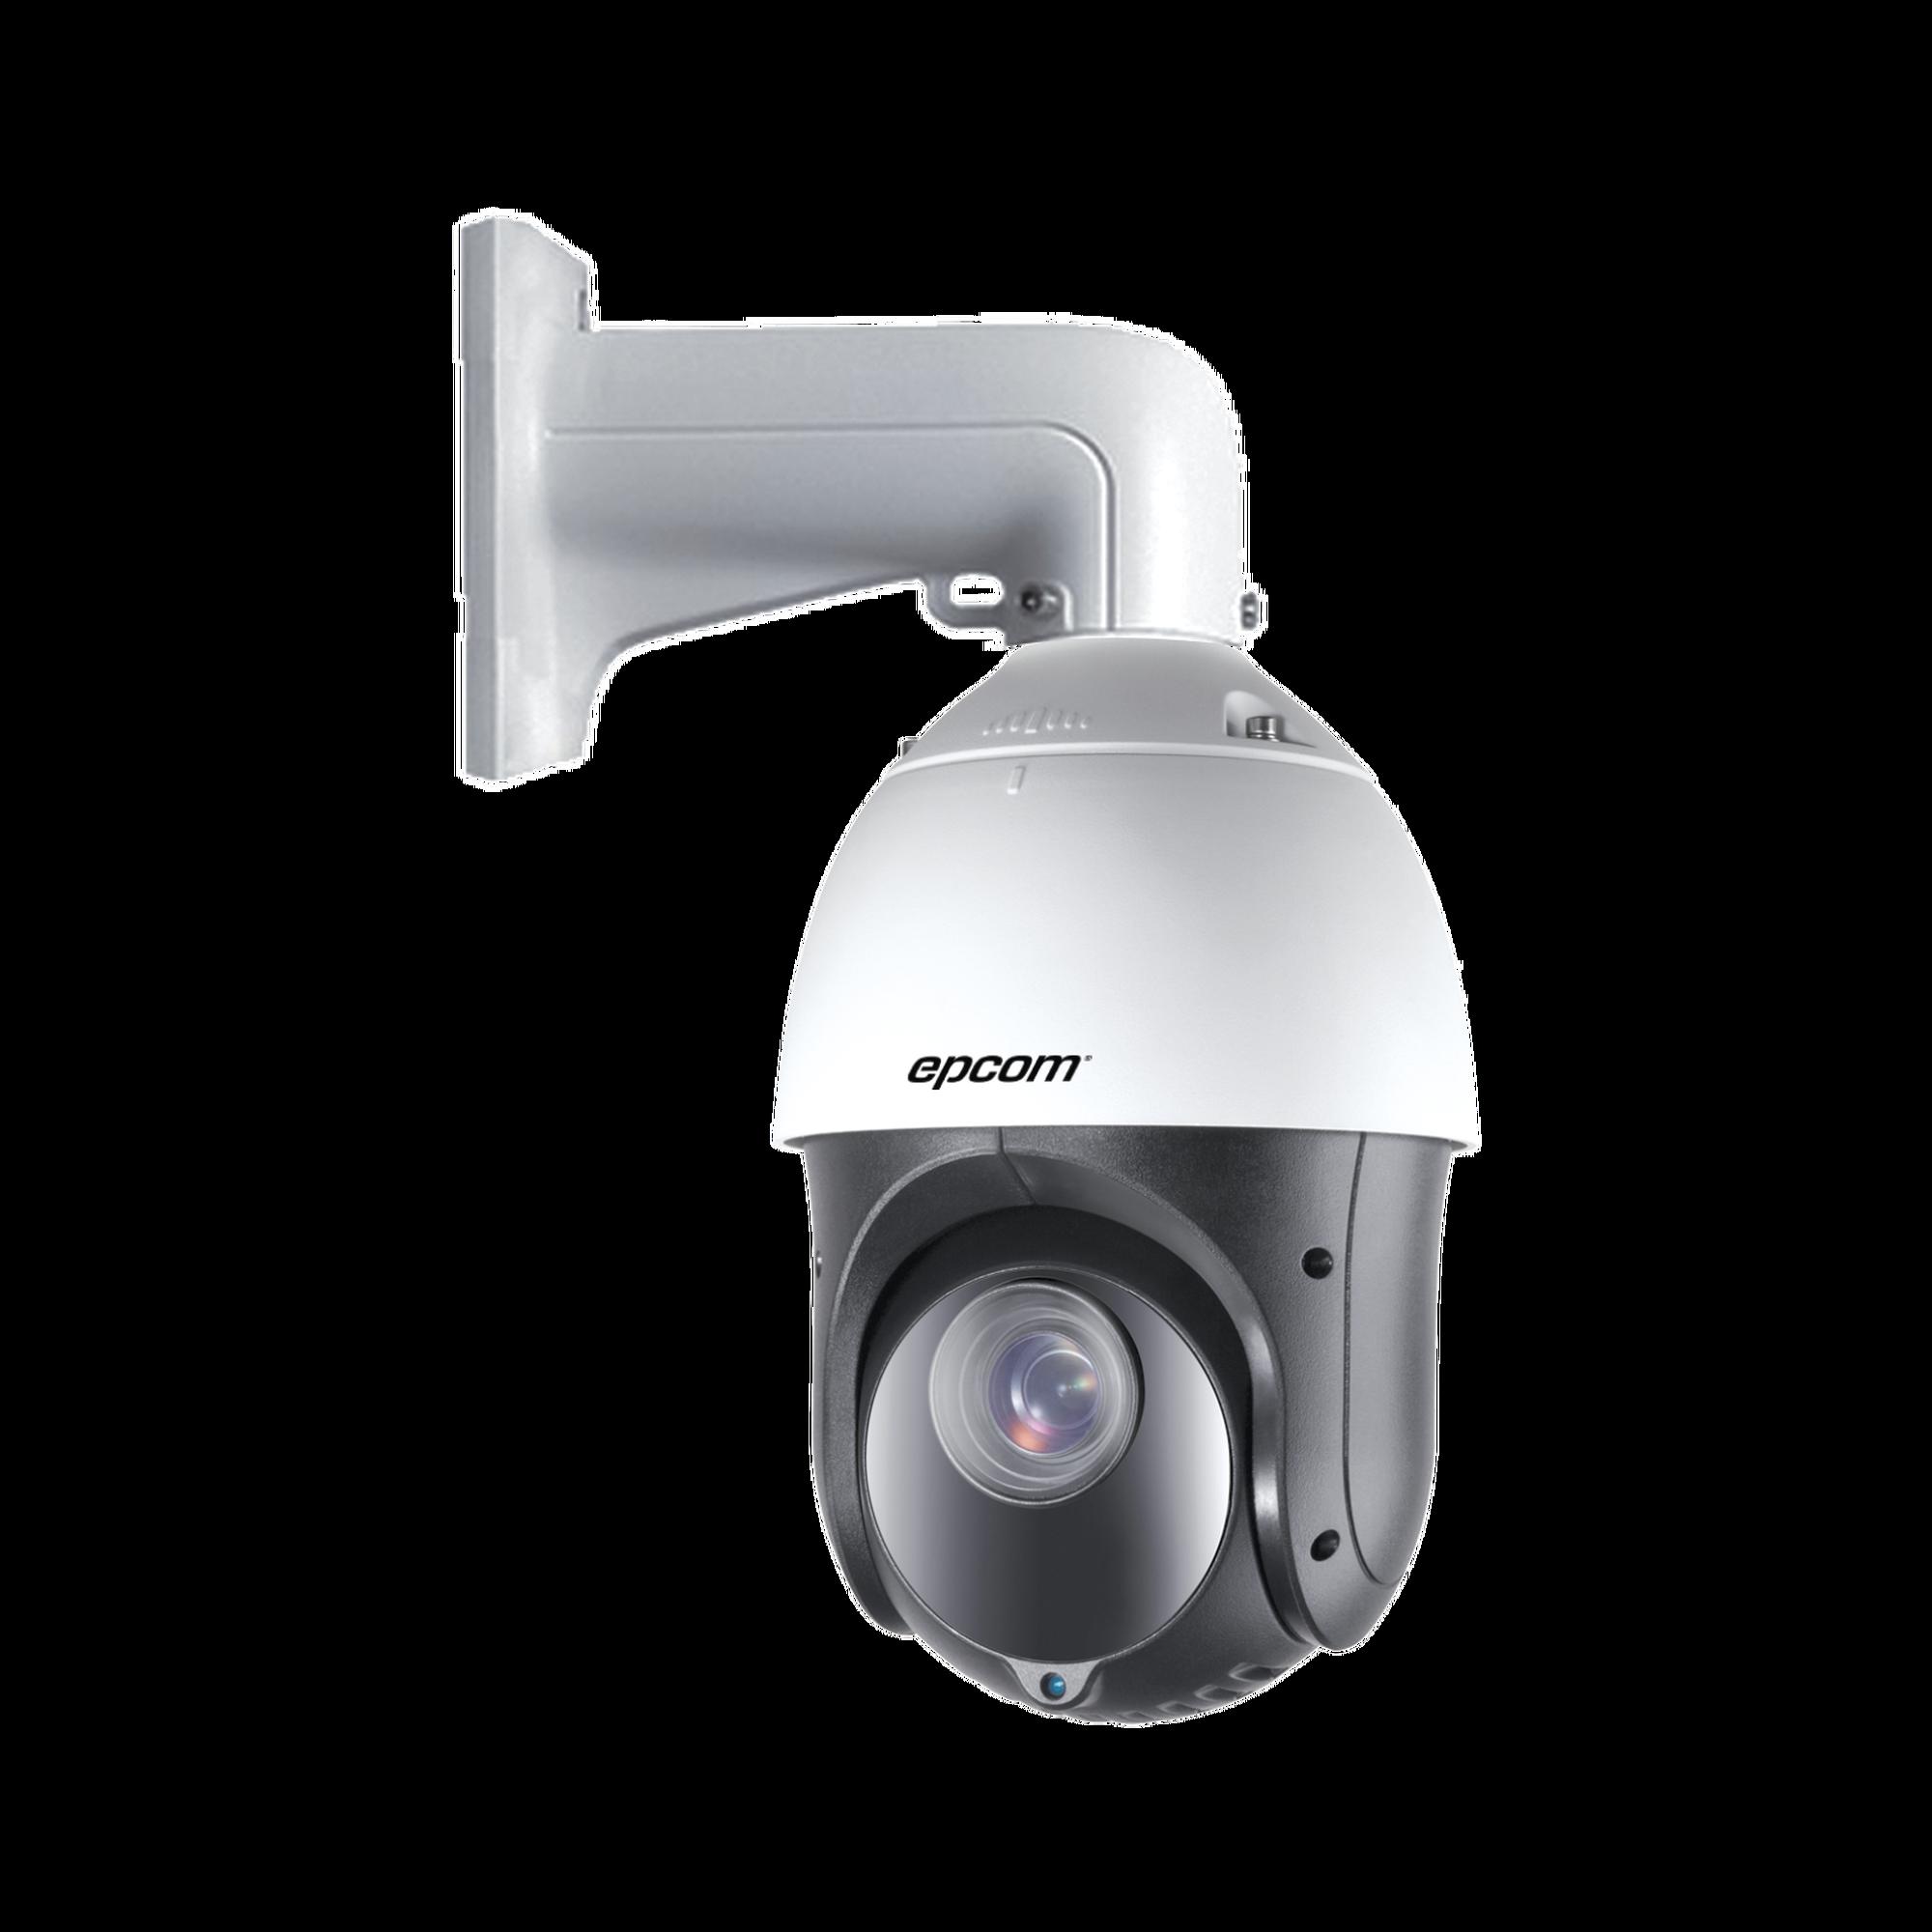 PTZ TURBO HD 1080P / 15X Zoom / 100 mts IR EXIR / WDR 120 dB / Coaxitron / RS485 / Exterior IP66 /  4 Tecnologías (TVI / AHD / CVI / CVBS) / Ultra Baja Iluminación